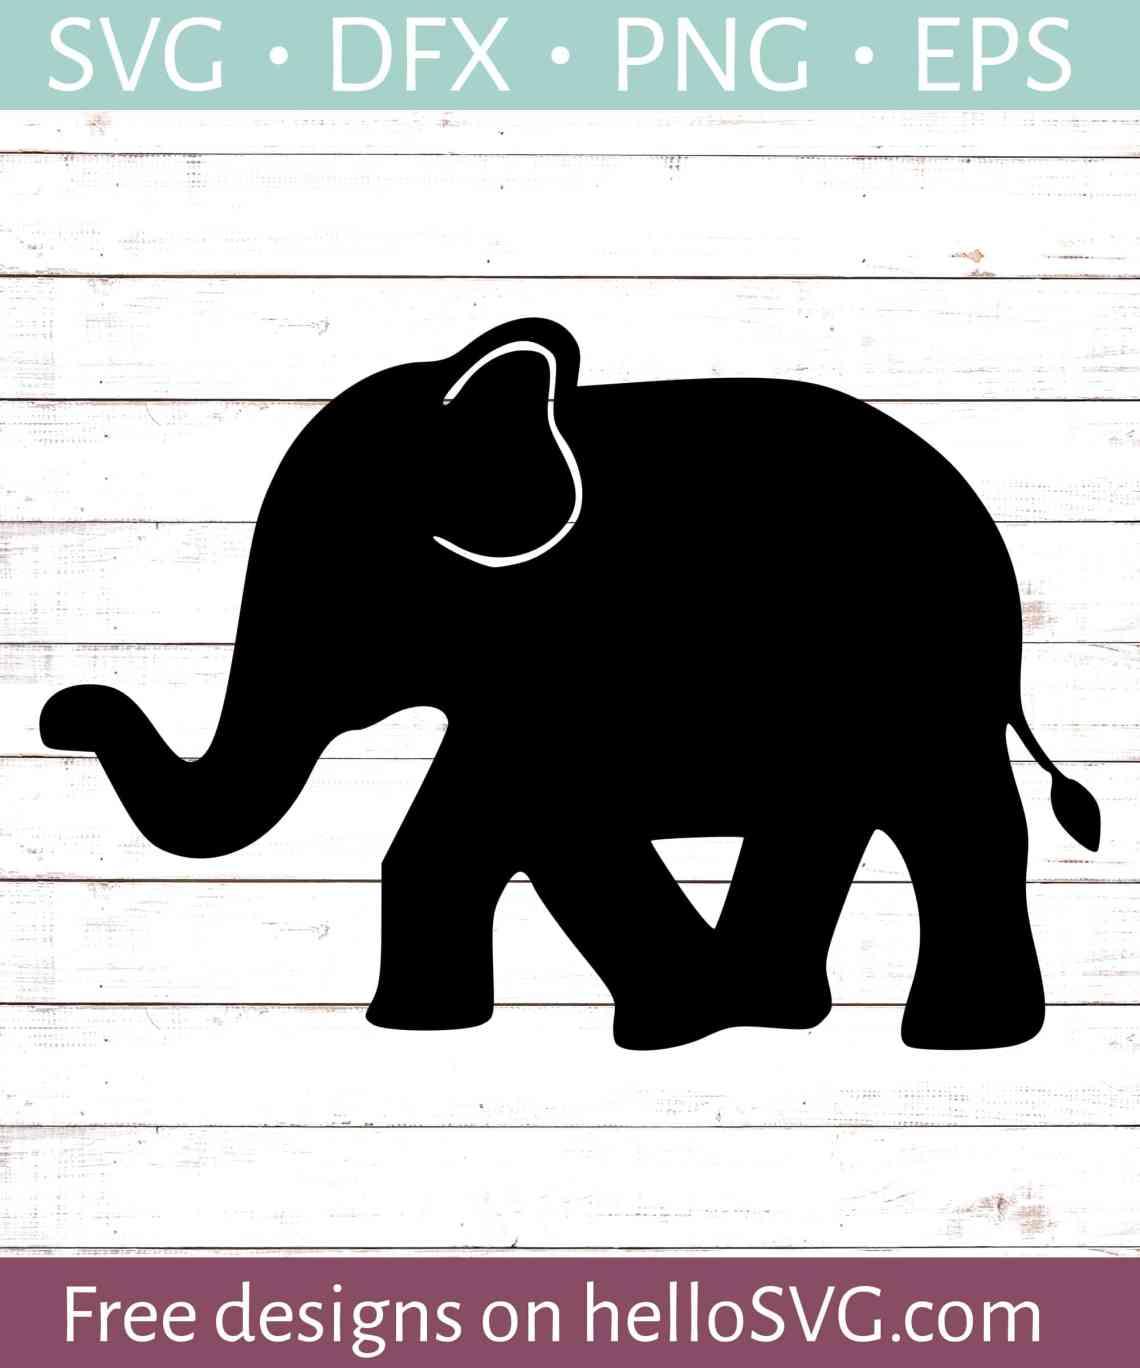 Download Walking Elephant SVG - Free SVG files | HelloSVG.com